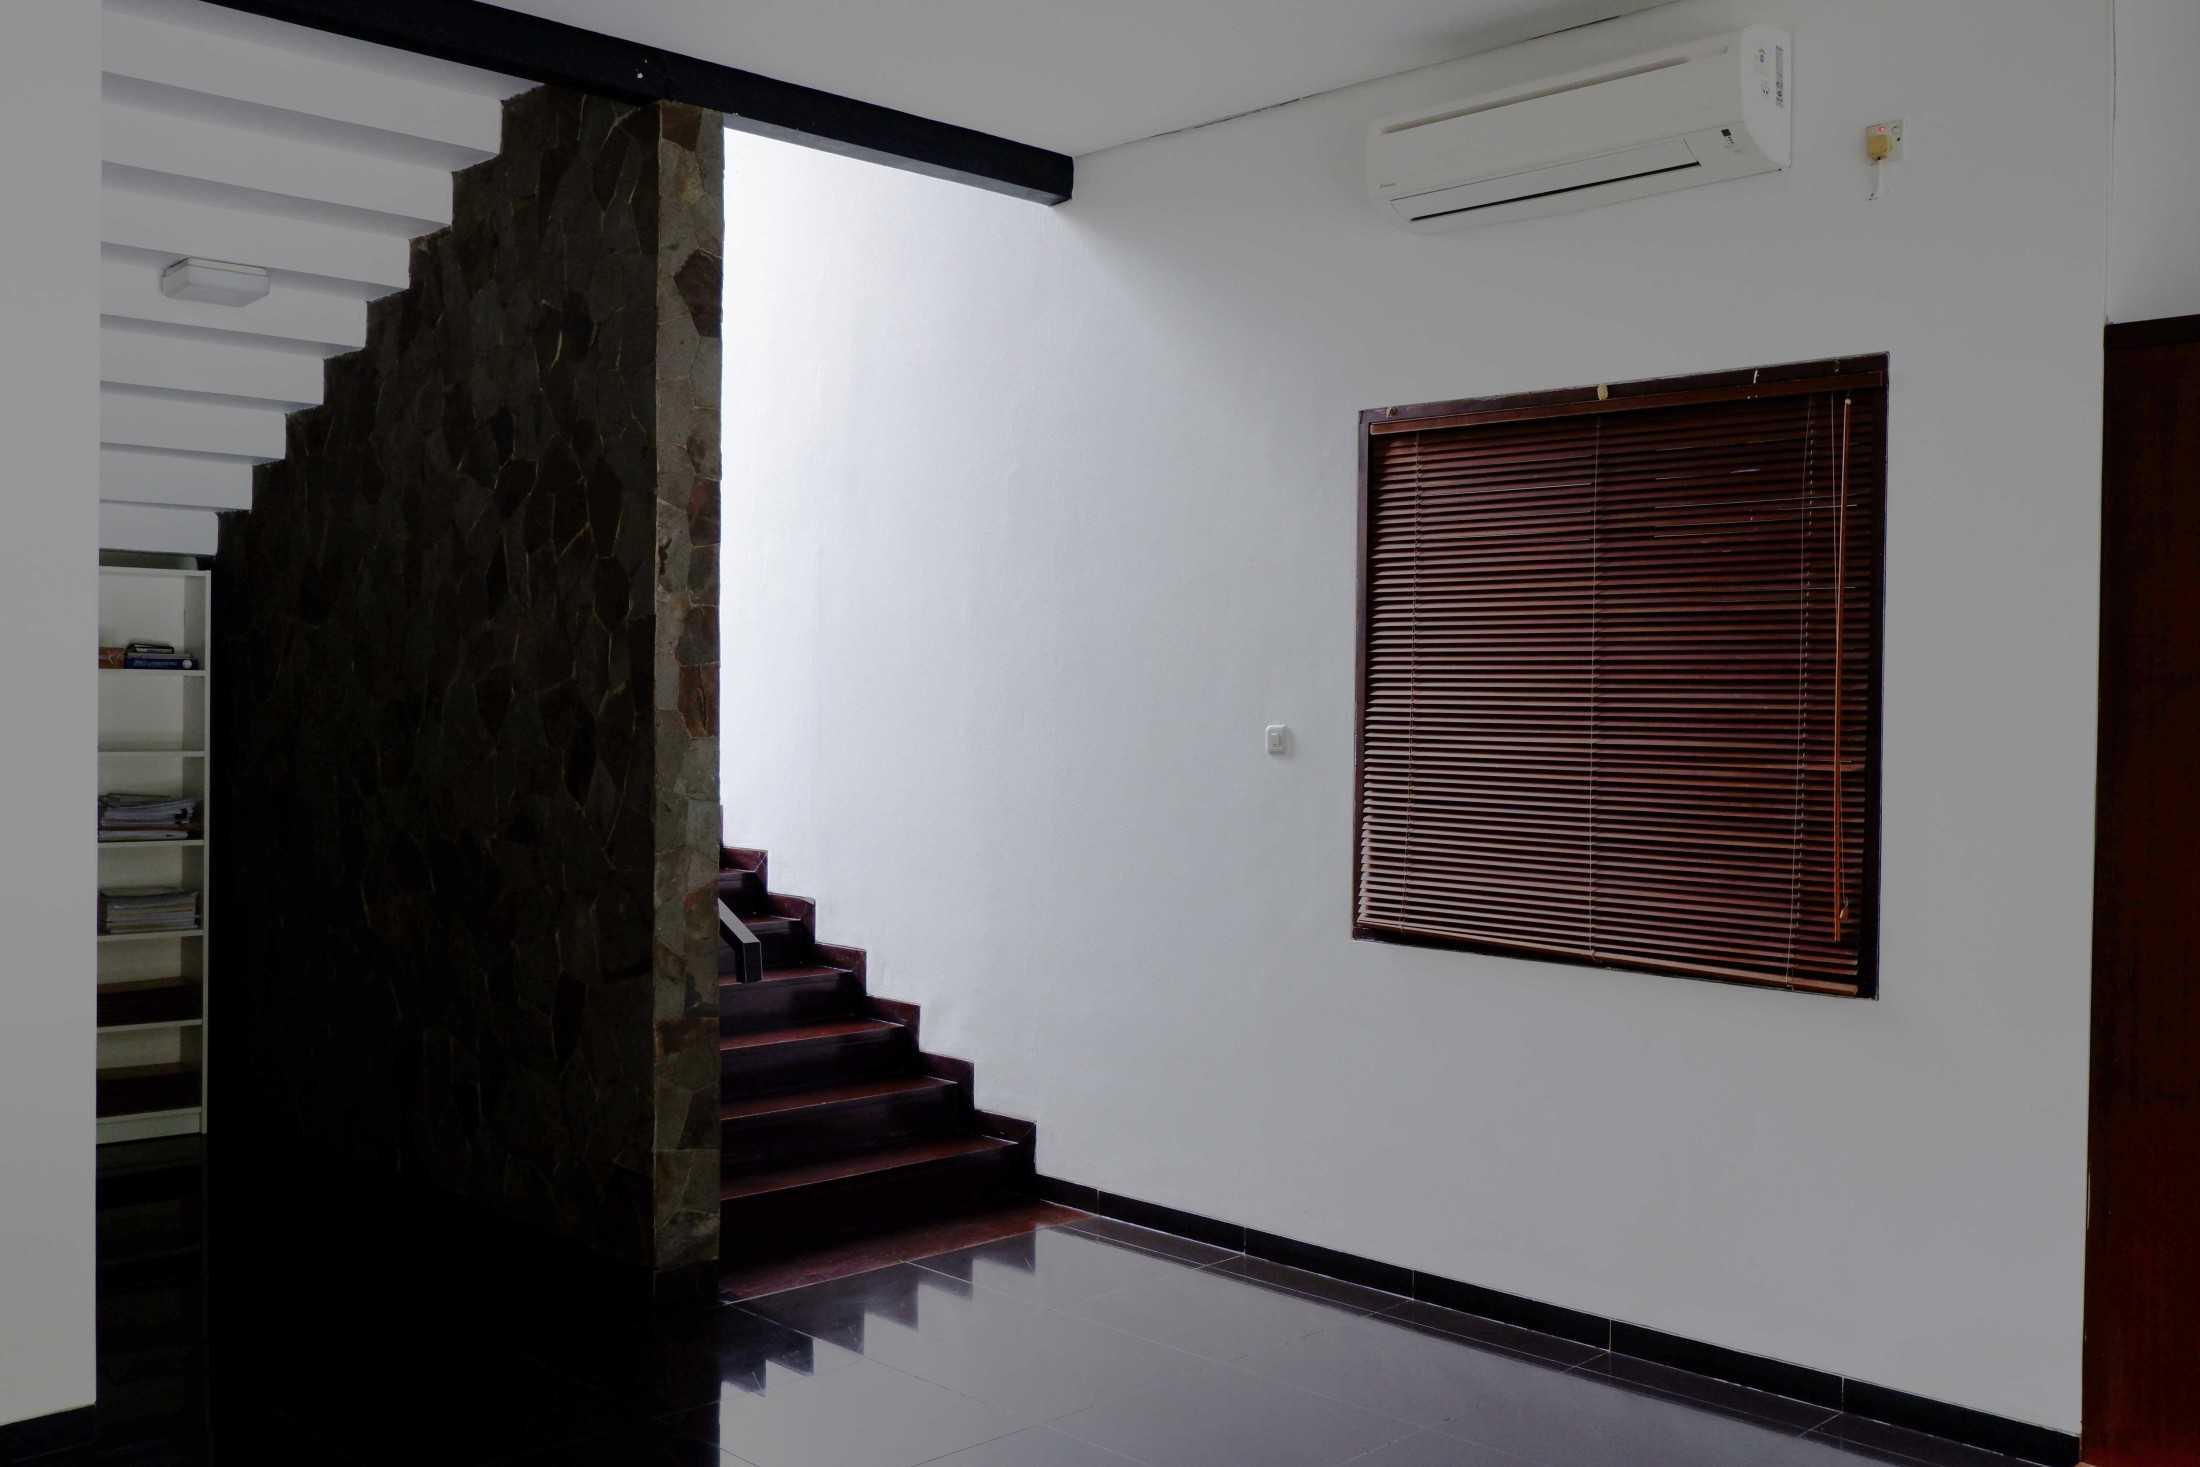 Lokative Studio Renovasi Rumah Cempaka Jakarta, Daerah Khusus Ibukota Jakarta, Indonesia Jakarta, Daerah Khusus Ibukota Jakarta, Indonesia Lokative-Studio-Renovasi-Rumah-Cempaka  97466